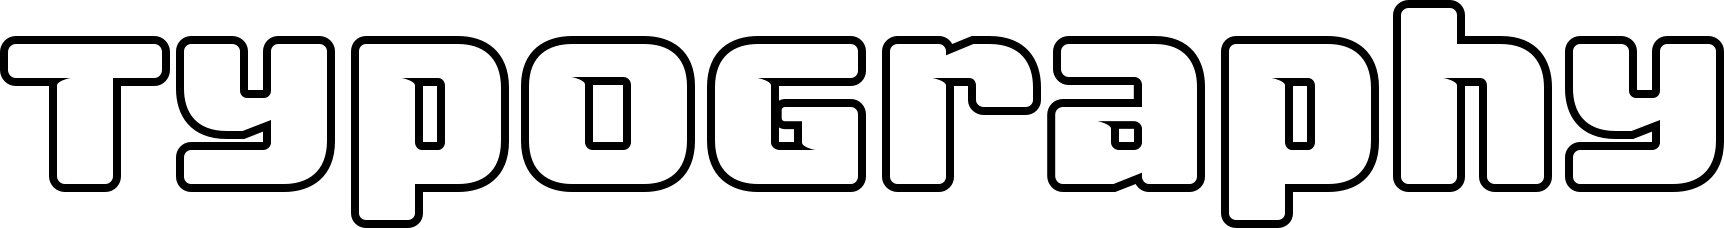 Fuel Uni Outline Font by VersusTwin : Font Bros